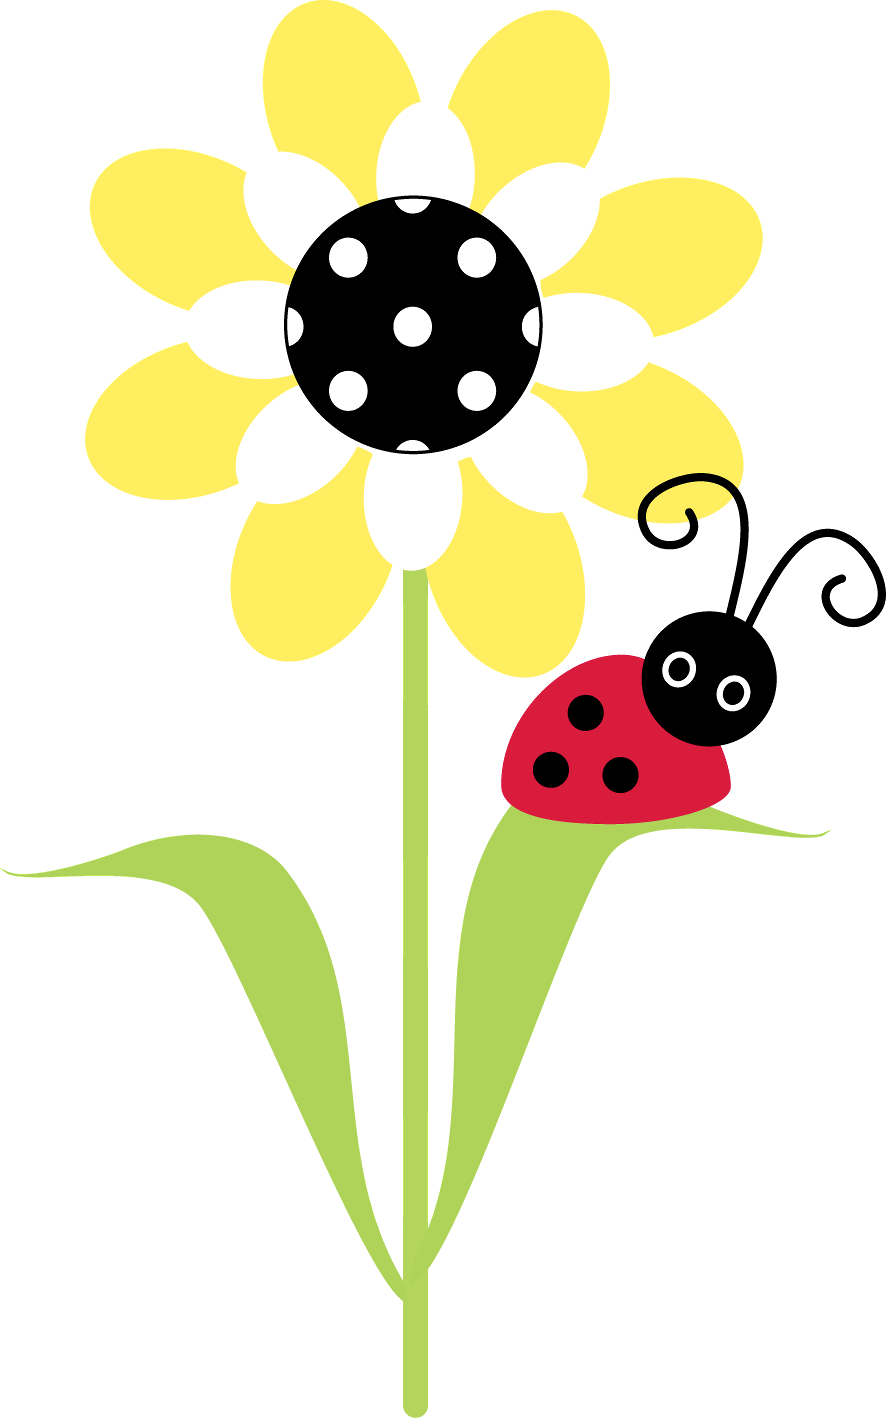 Ladybug flower clipart banner freeuse stock http://daniellemoraesfalcao.minus.com/i/brxMqfFAxCpJa | CLIPART ... banner freeuse stock